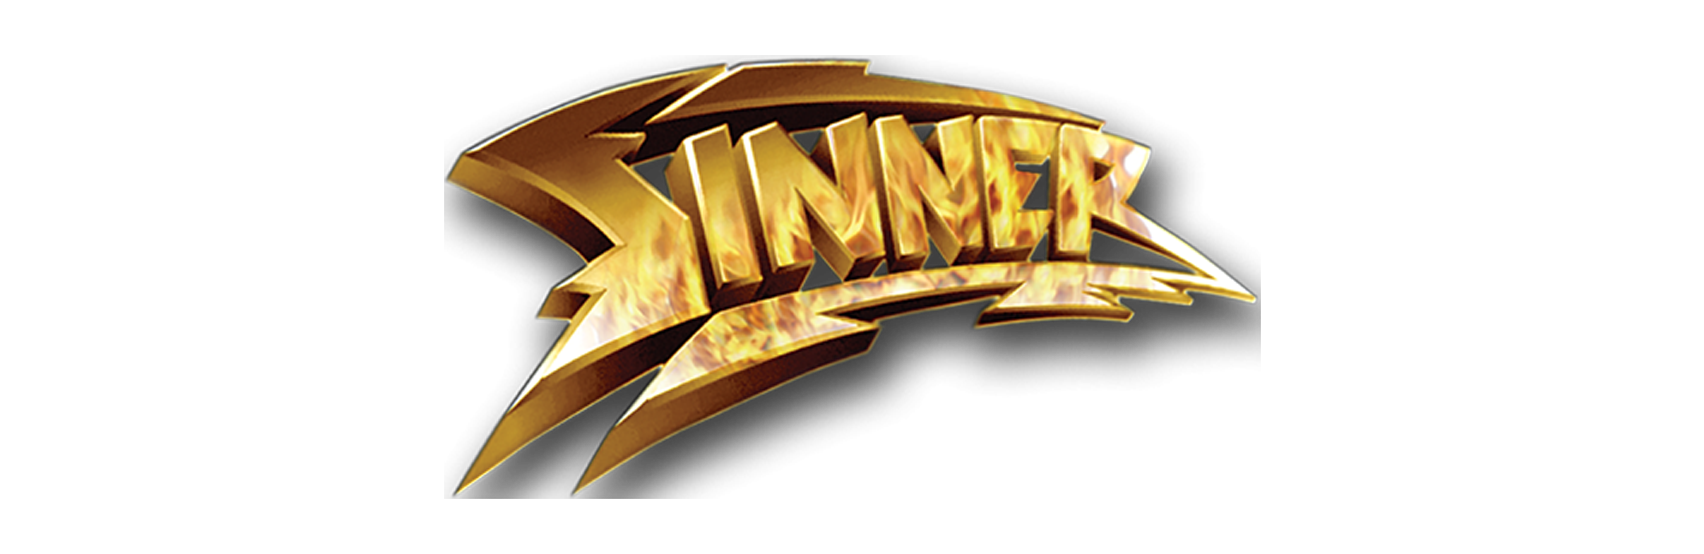 Sinner Logo